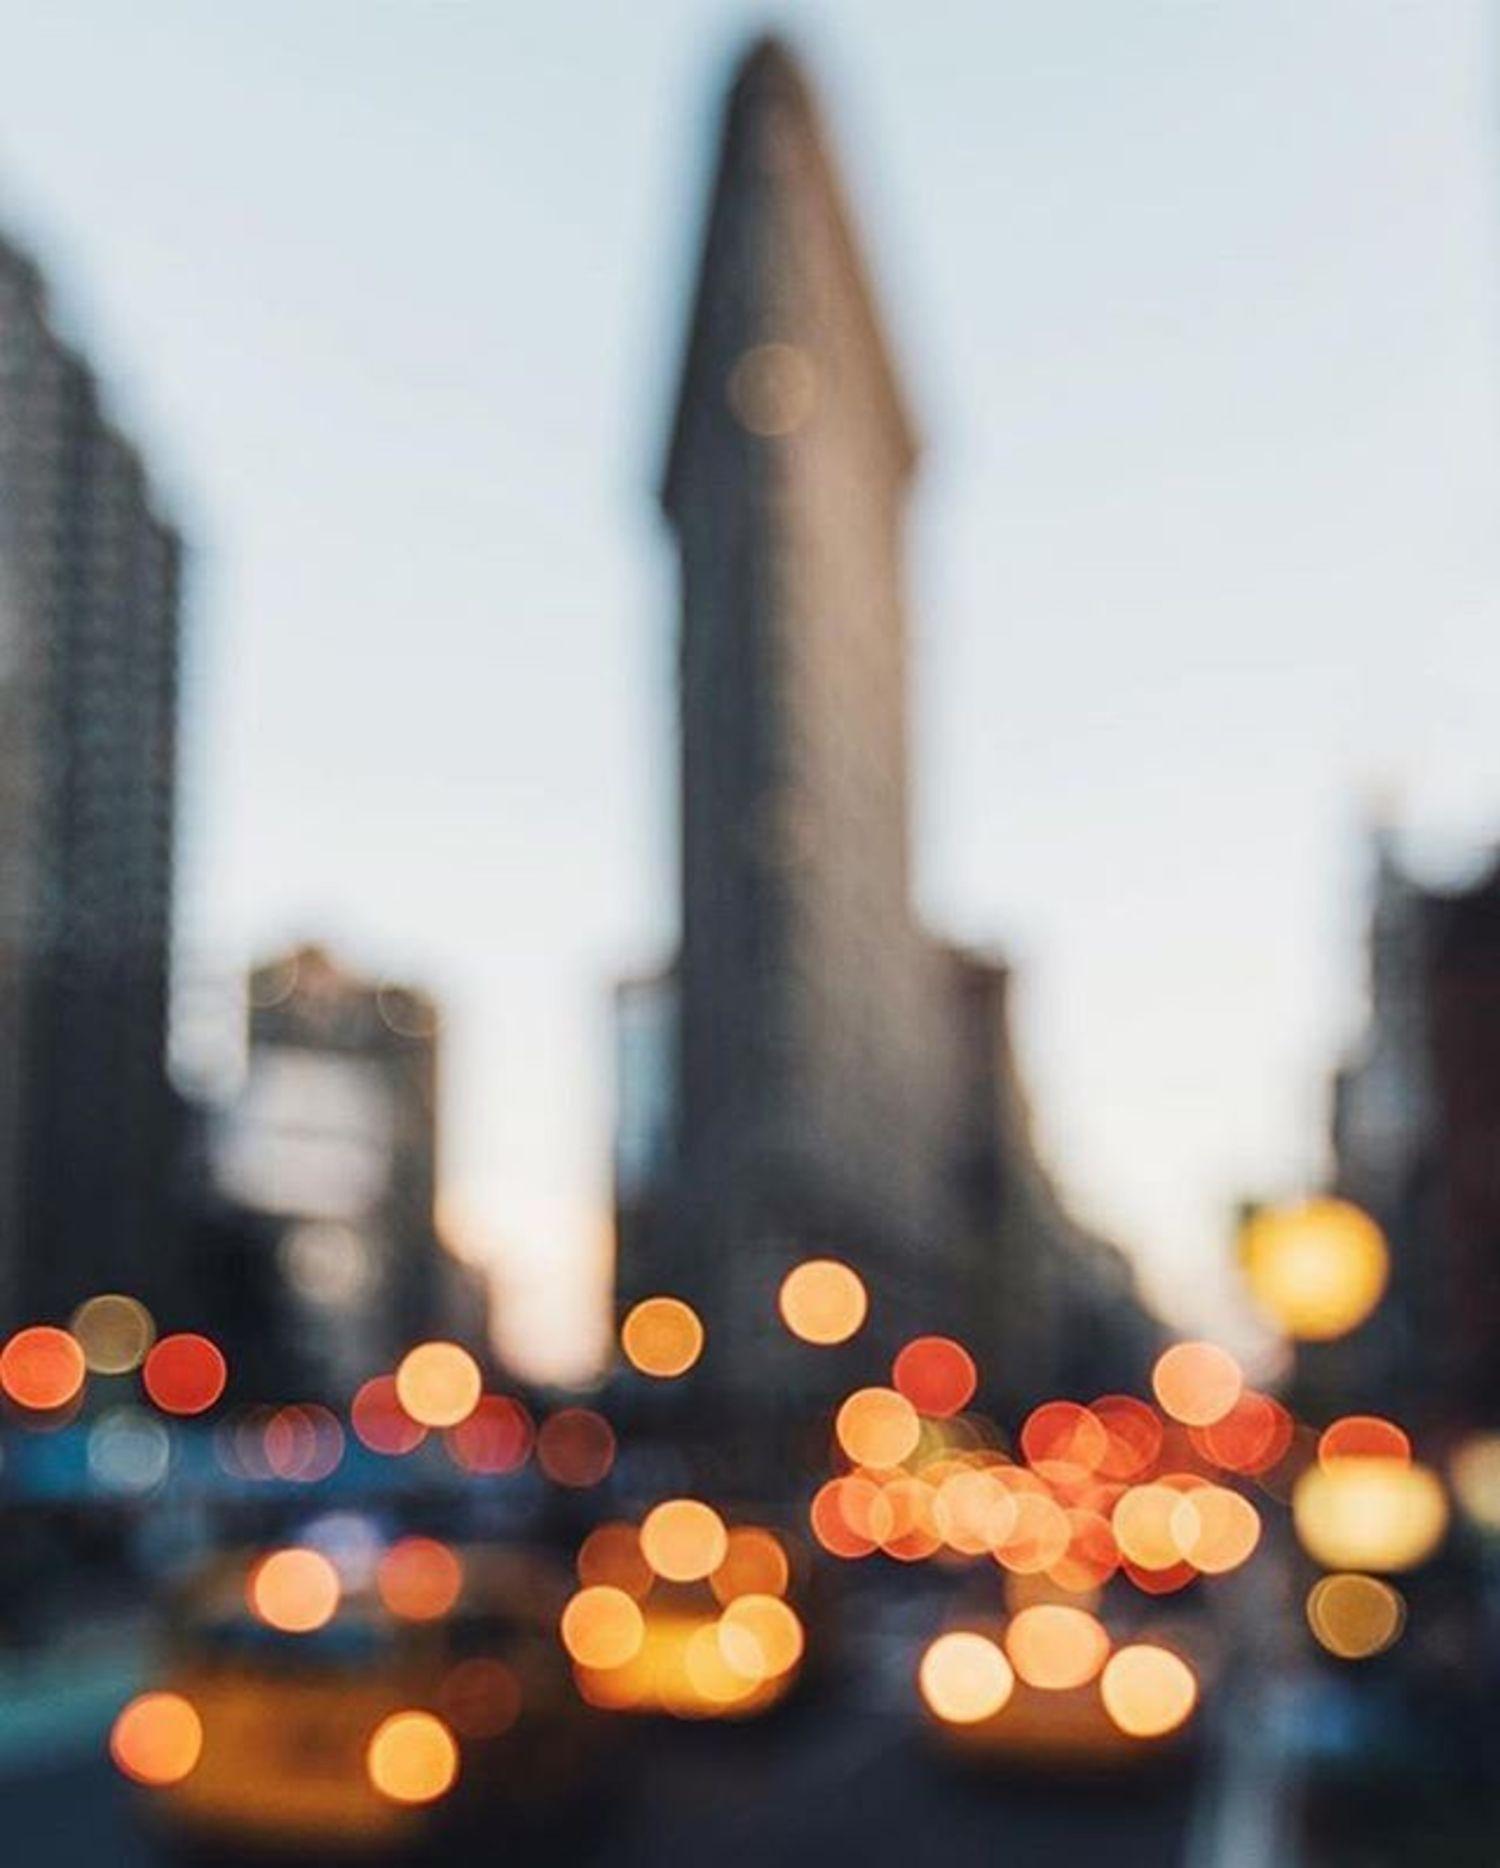 Flatiron Building, New York, New York. Photo via @sorgentegroupofamerica #viewingnyc #newyork #newyorkcity #nyc